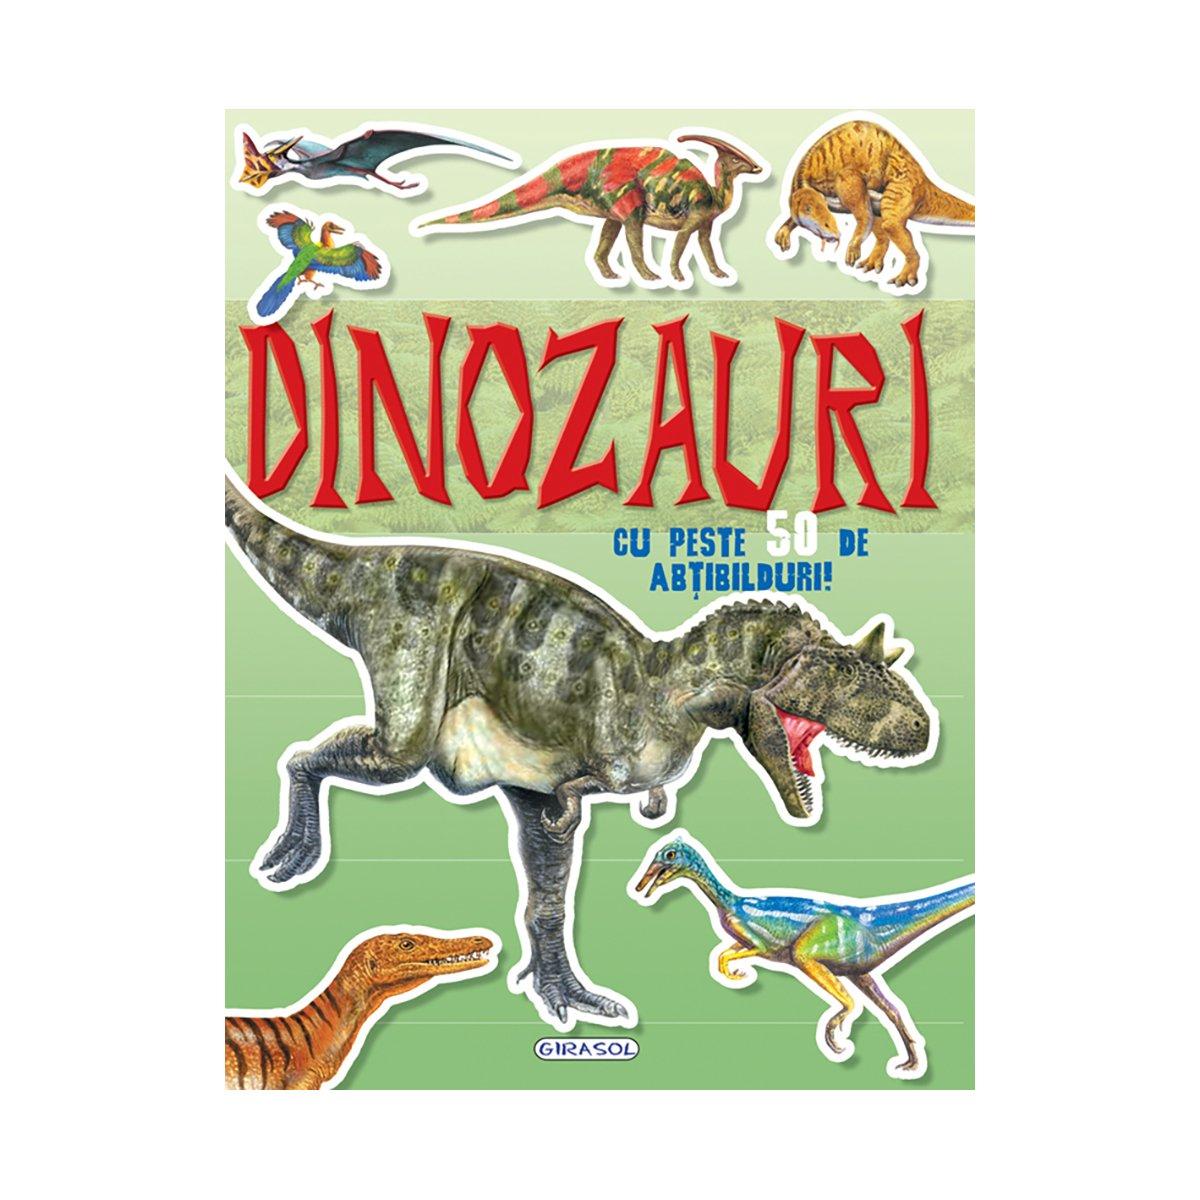 Carte Editura Girasol, Cauta si lipeste, Dinozauri